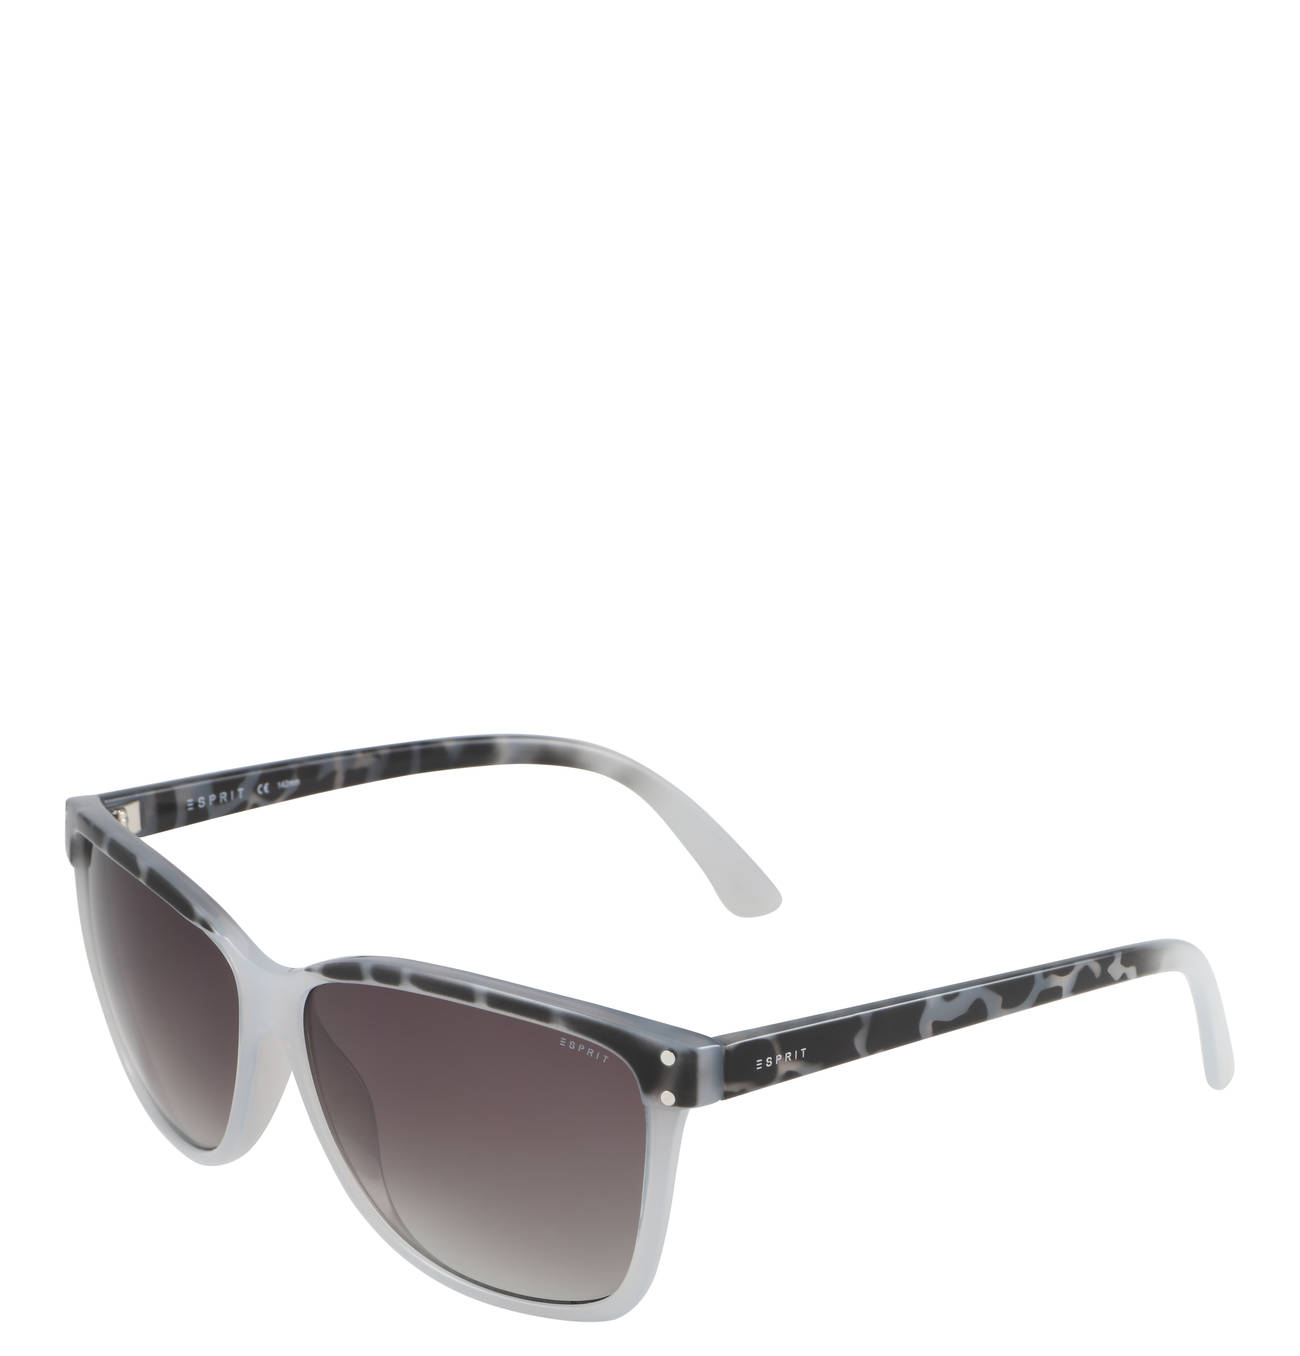 Esprit Sonnenbrille Unisex